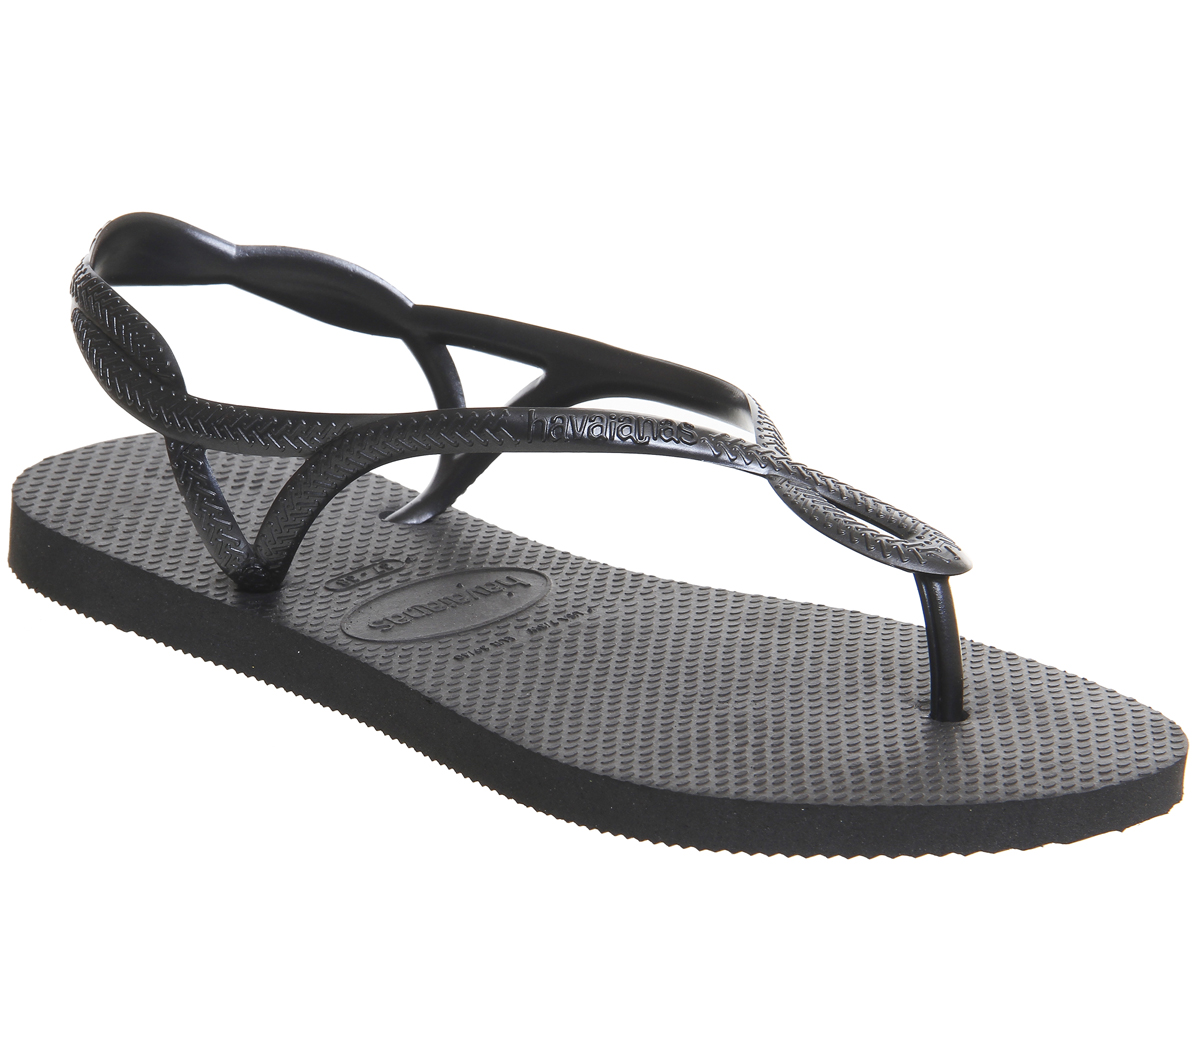 a3e69bb22d93 Sentinel Womens Havaianas Luna Flip Flops Black Sandals